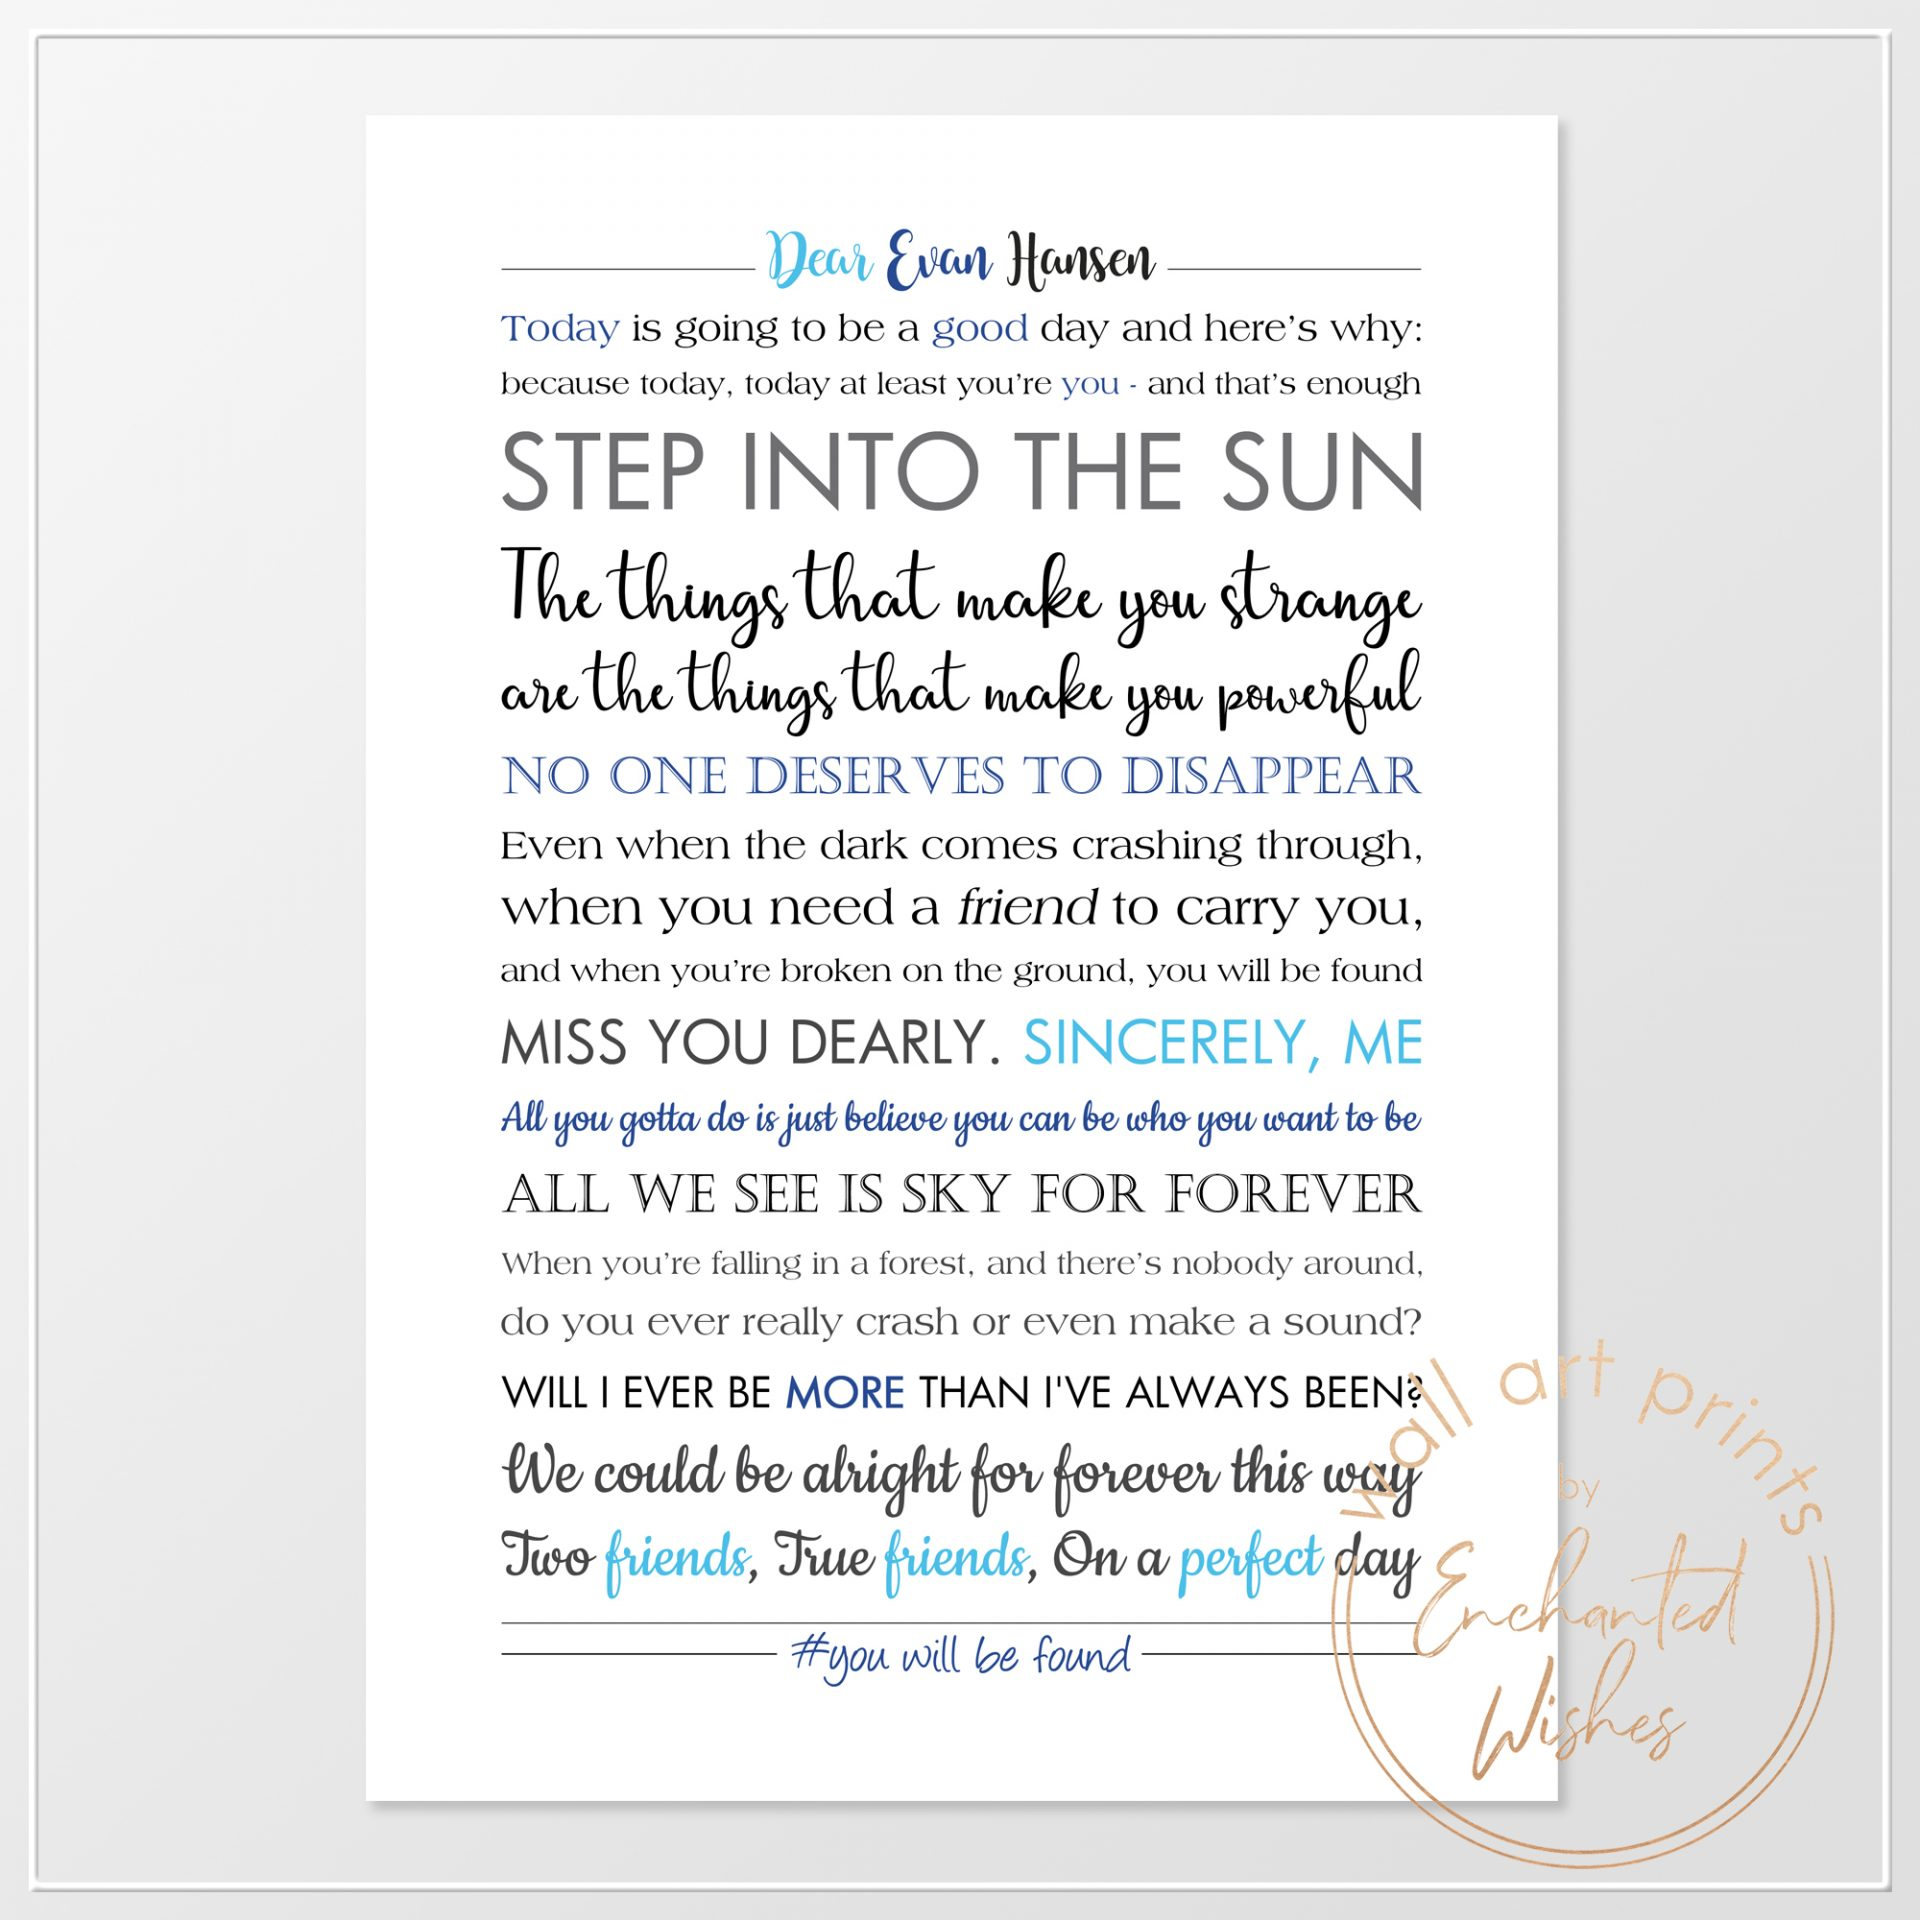 Dear Evan Hansen Quotes print